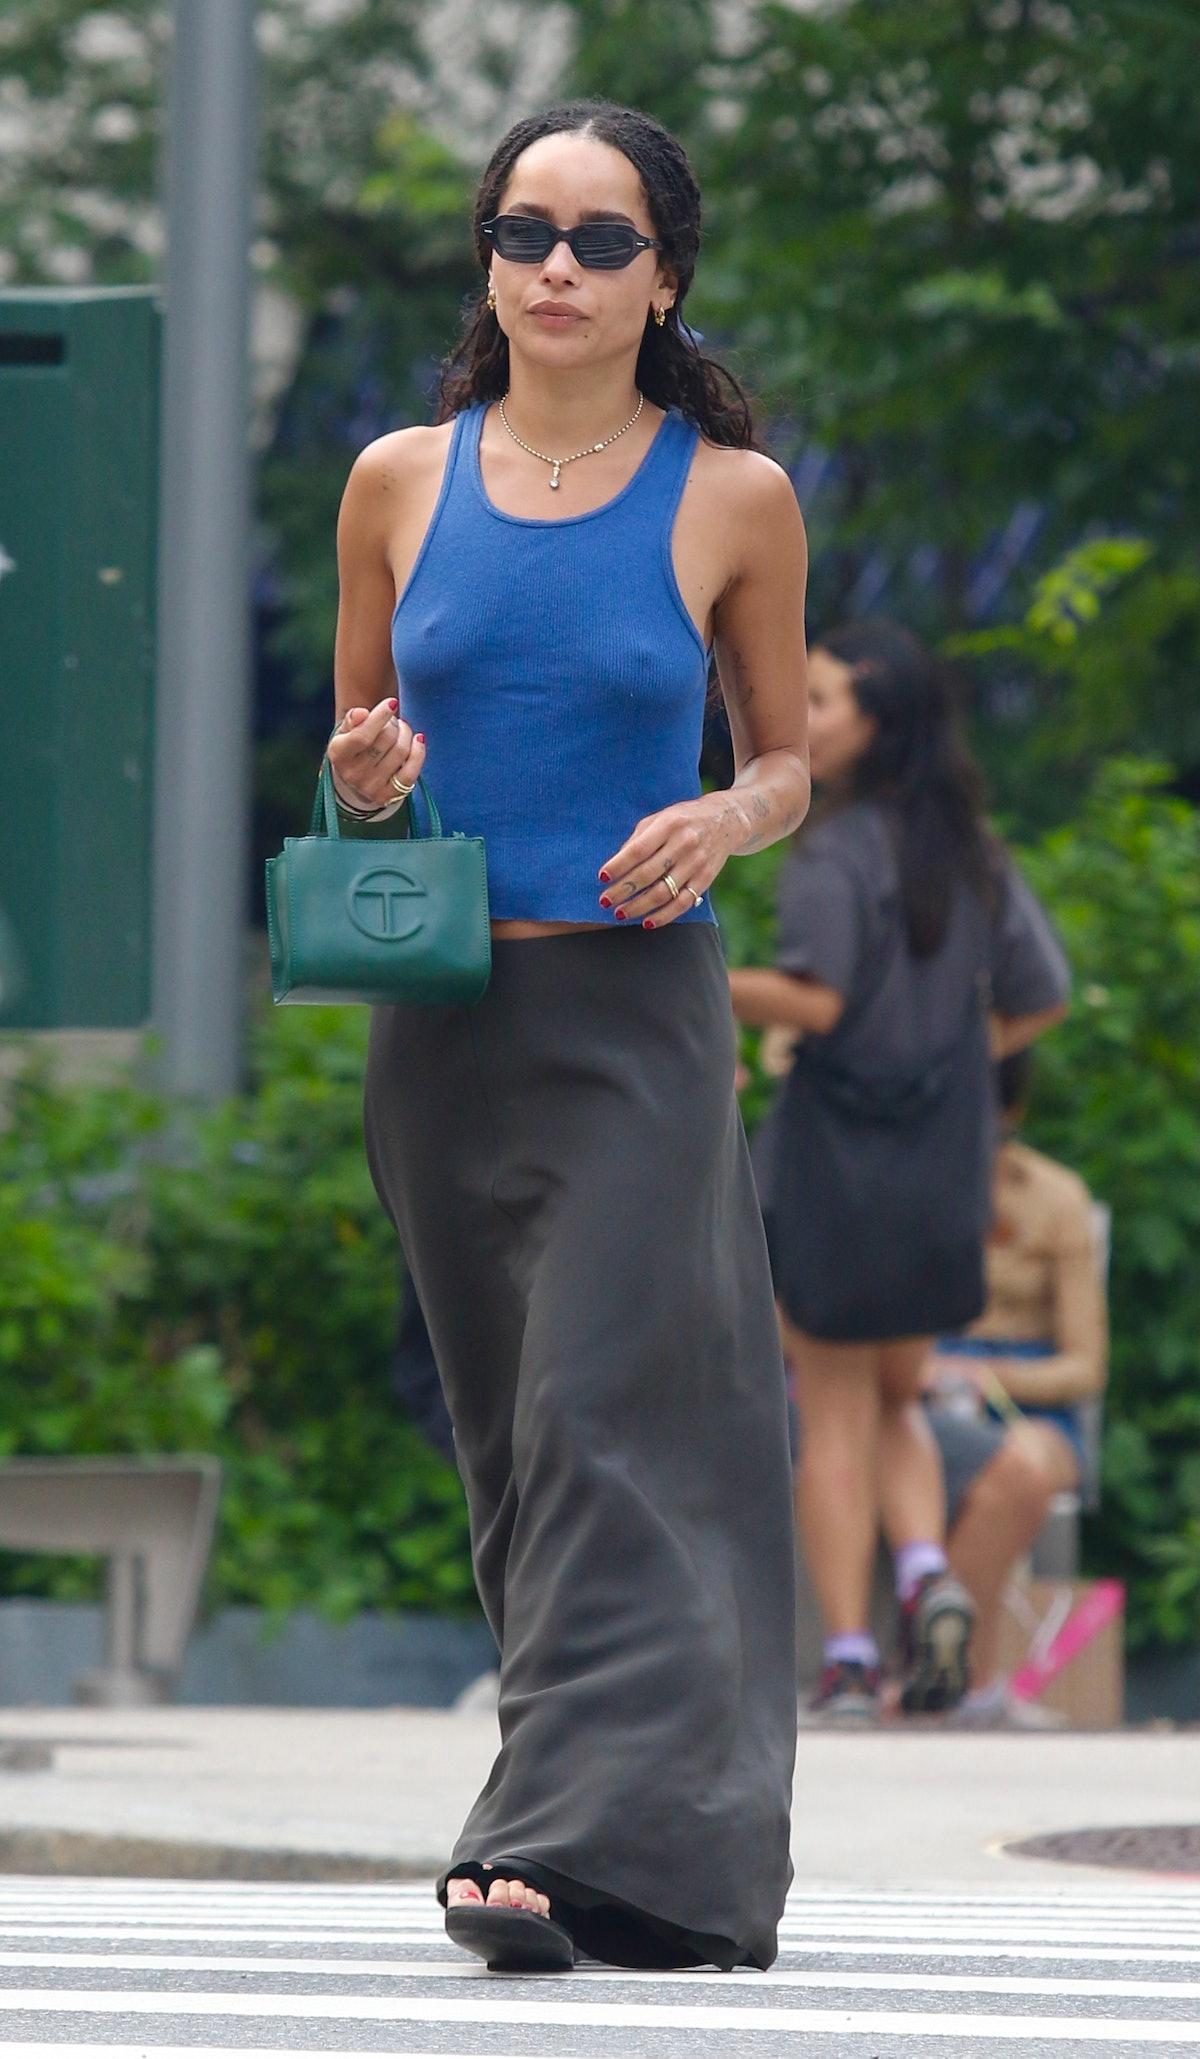 Zoe Kravitz with a green Telfar bag.